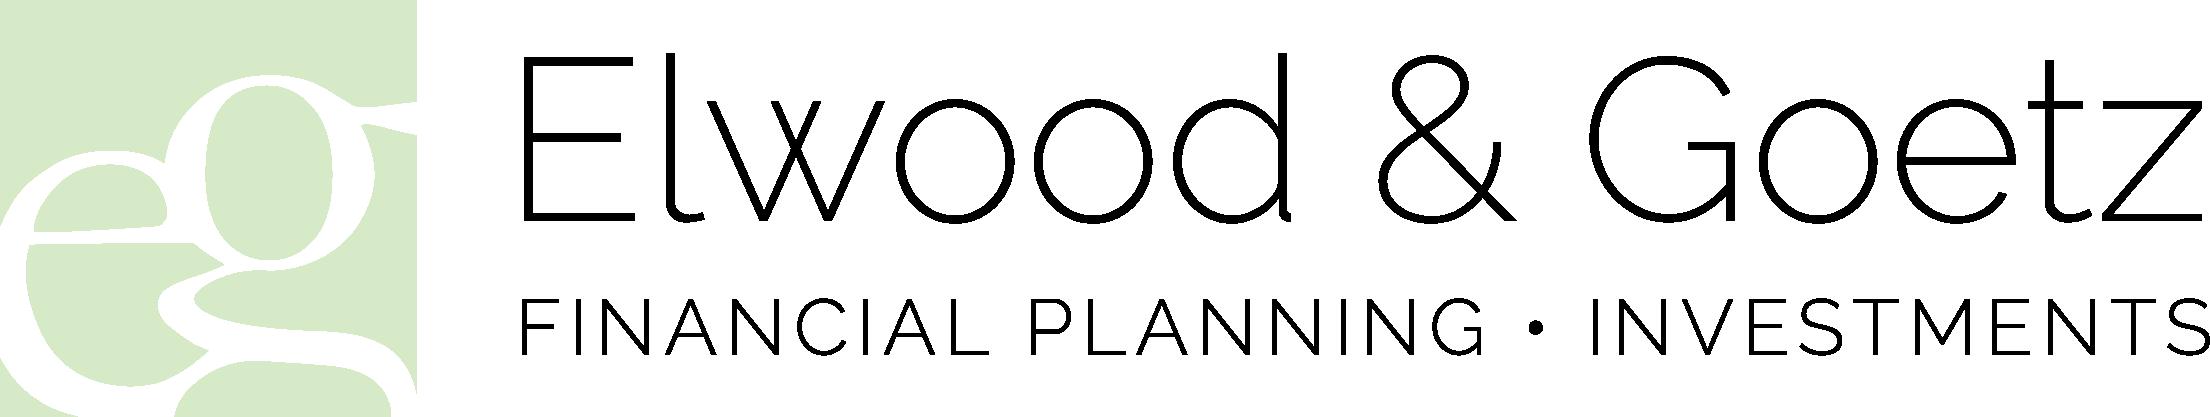 Elwood & Goetz  Wealth Advisory Group black logo